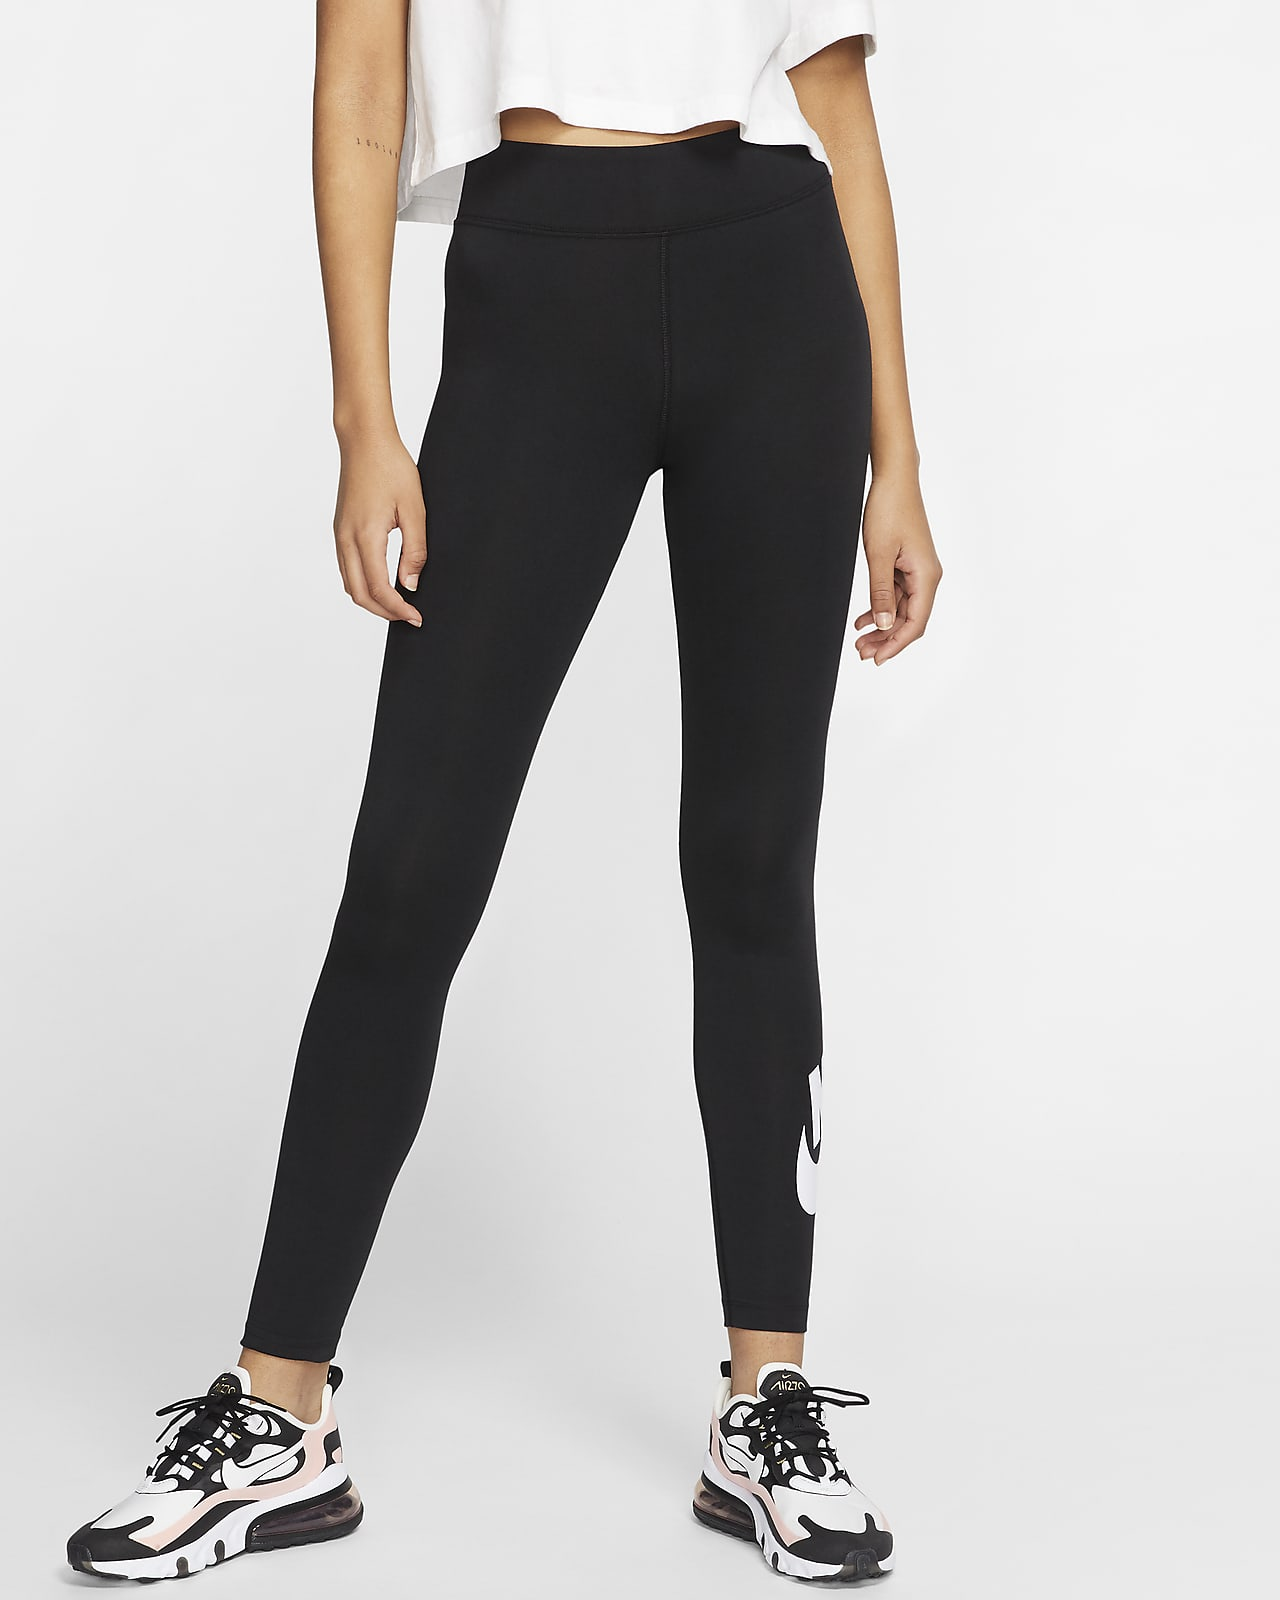 Collant taille haute Nike Sportswear pour Femme